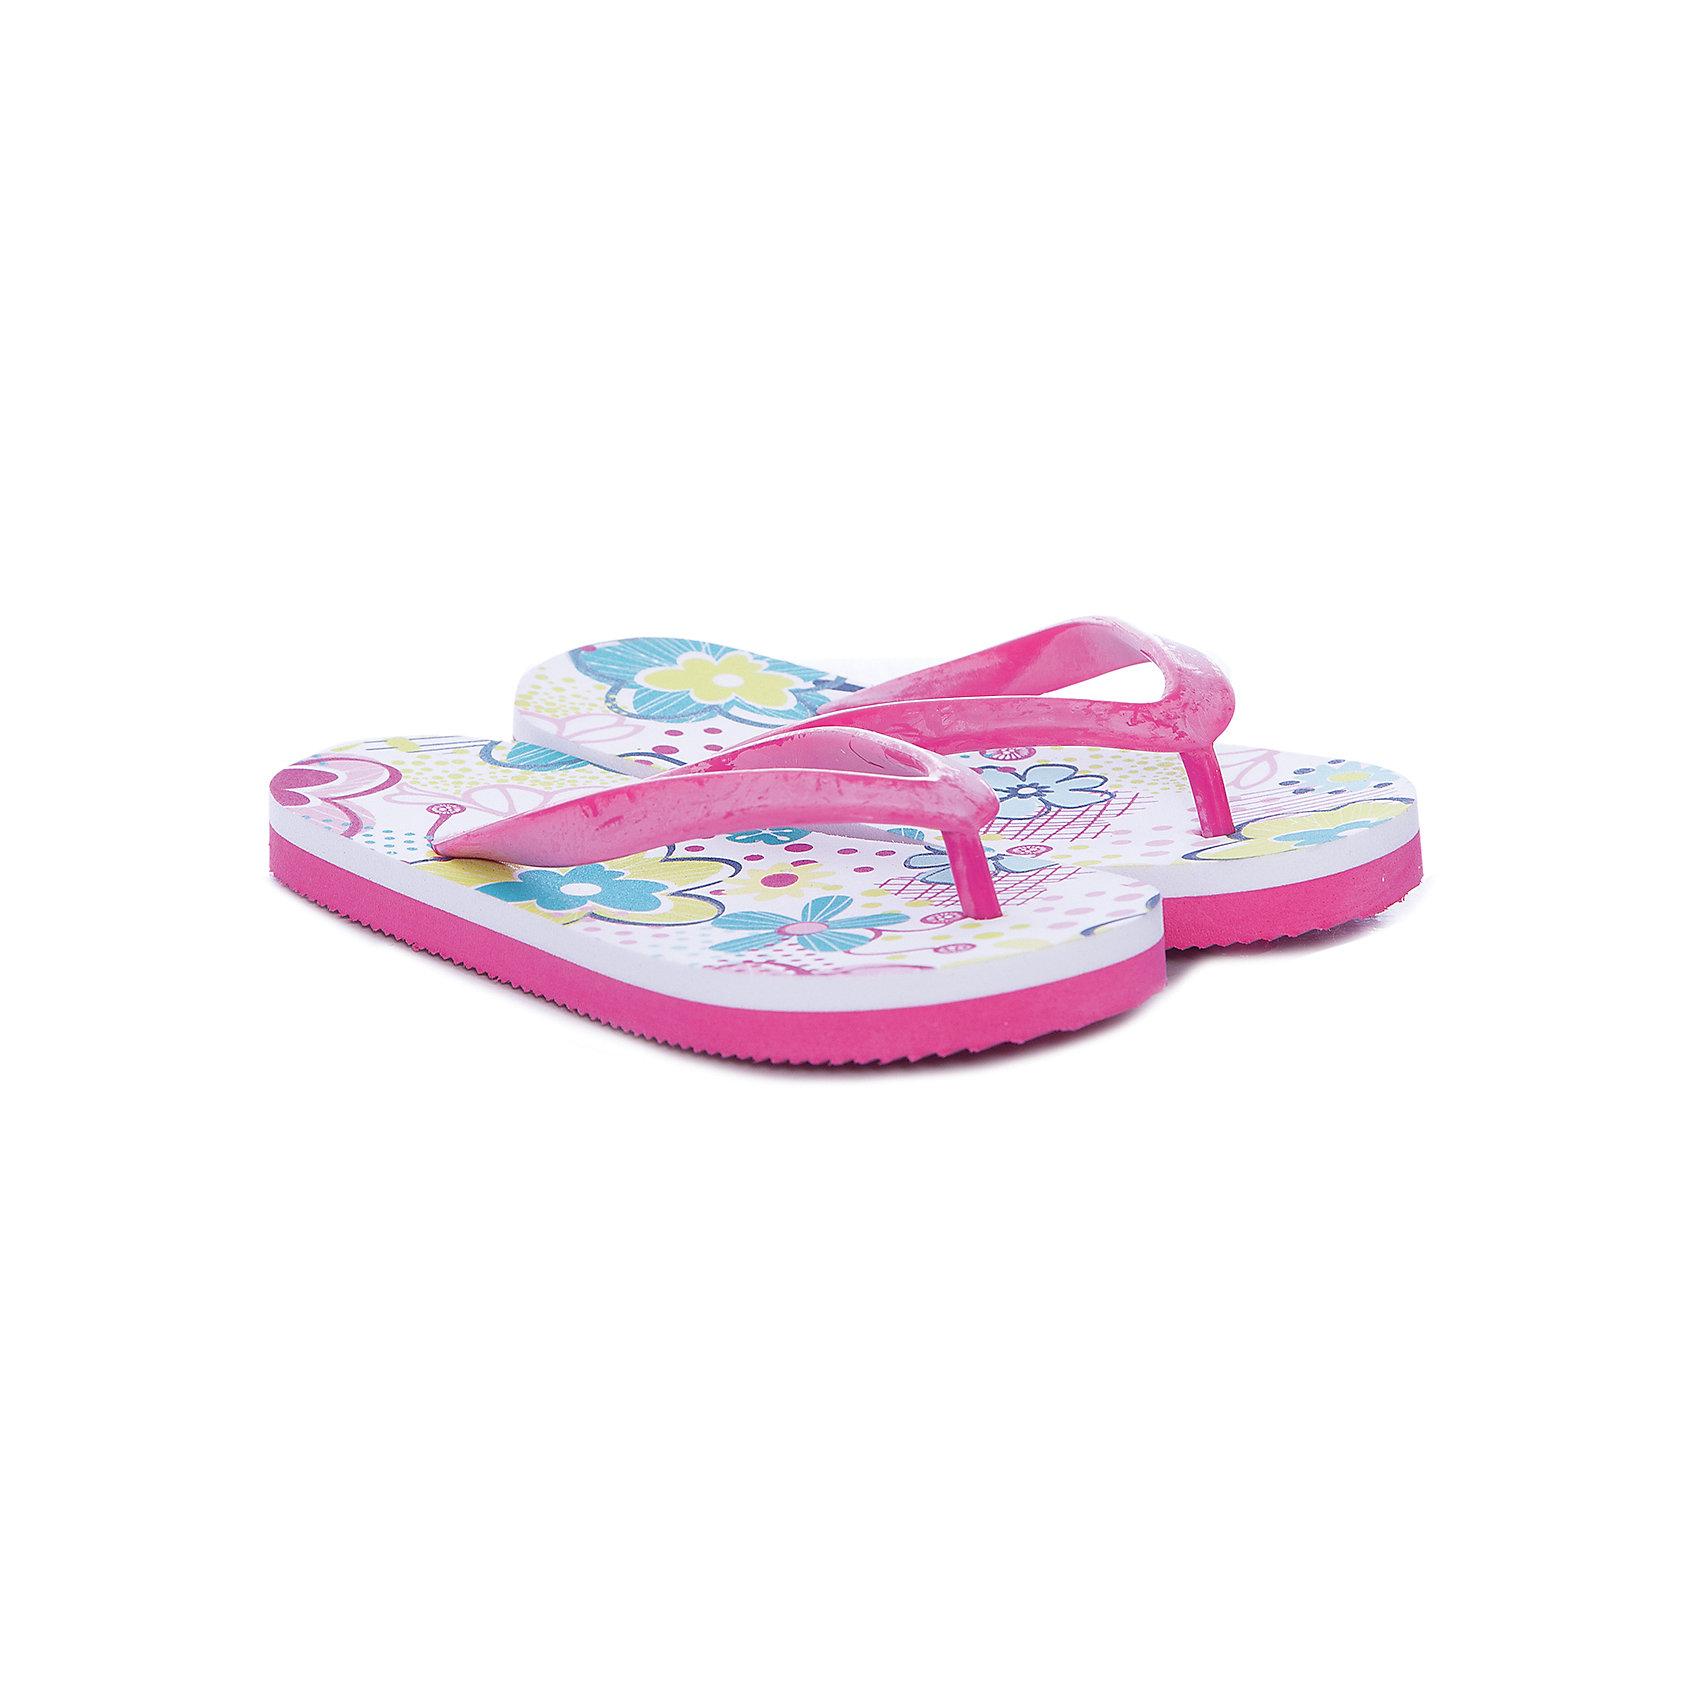 Шлепанцы для девочки PlayTodayПляжная обувь<br>Пантолеты для девочки от известного бренда PlayToday<br>Яркие непромокаемые пантолеты для жаркого лета.<br>Состав:<br>Этиленвинилацетат<br><br>Ширина мм: 225<br>Глубина мм: 139<br>Высота мм: 112<br>Вес г: 290<br>Цвет: белый<br>Возраст от месяцев: 72<br>Возраст до месяцев: 84<br>Пол: Женский<br>Возраст: Детский<br>Размер: 30,25,26,27,28,29<br>SKU: 4789859